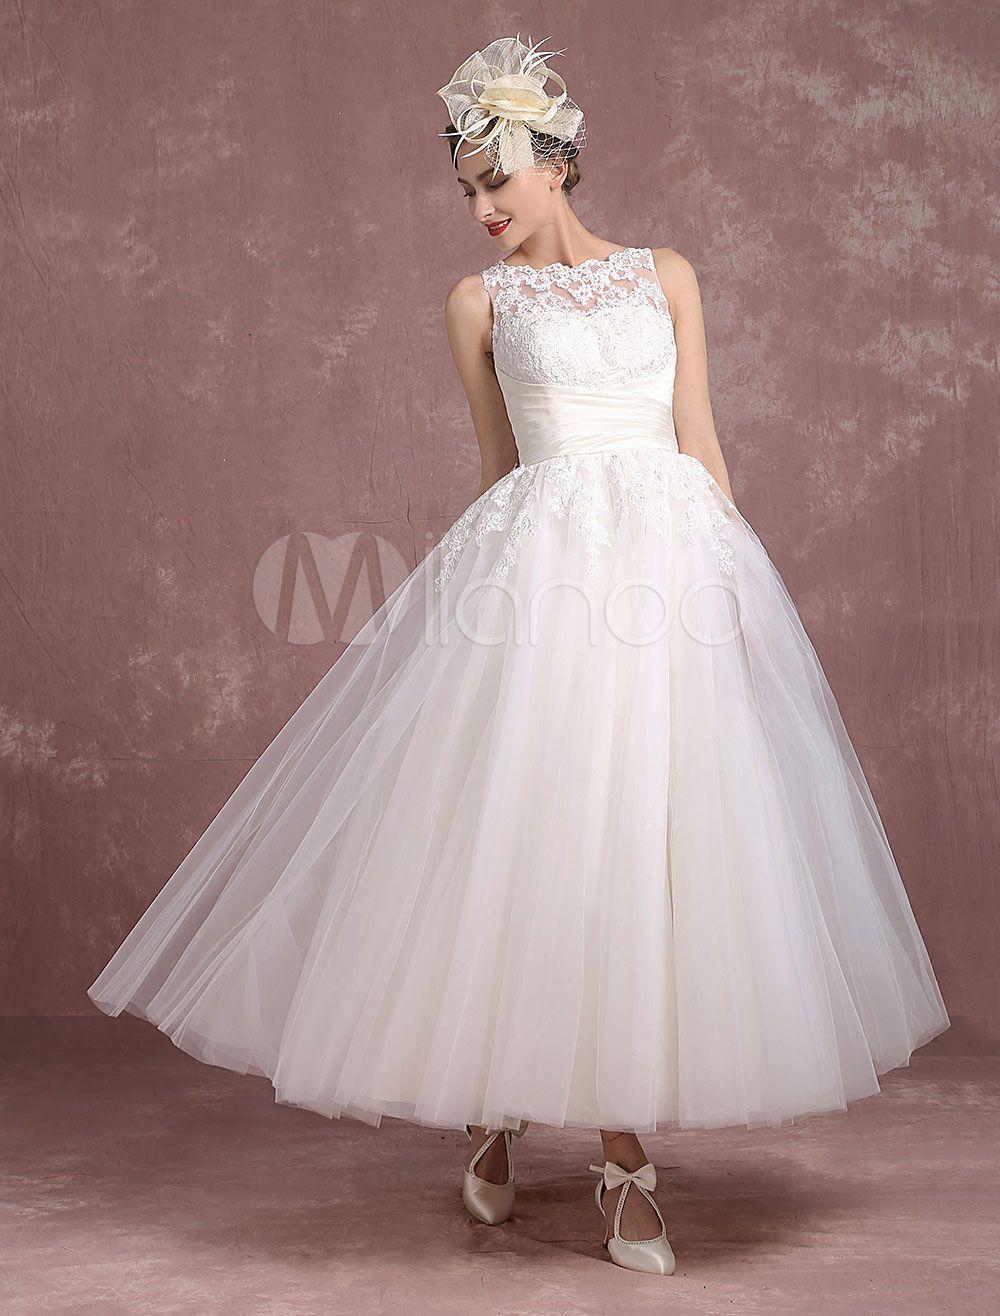 Wedding dress with bow on back  Vintage Wedding Dress Ivory Tulle Bridal Gown Back Split Bateau Lace